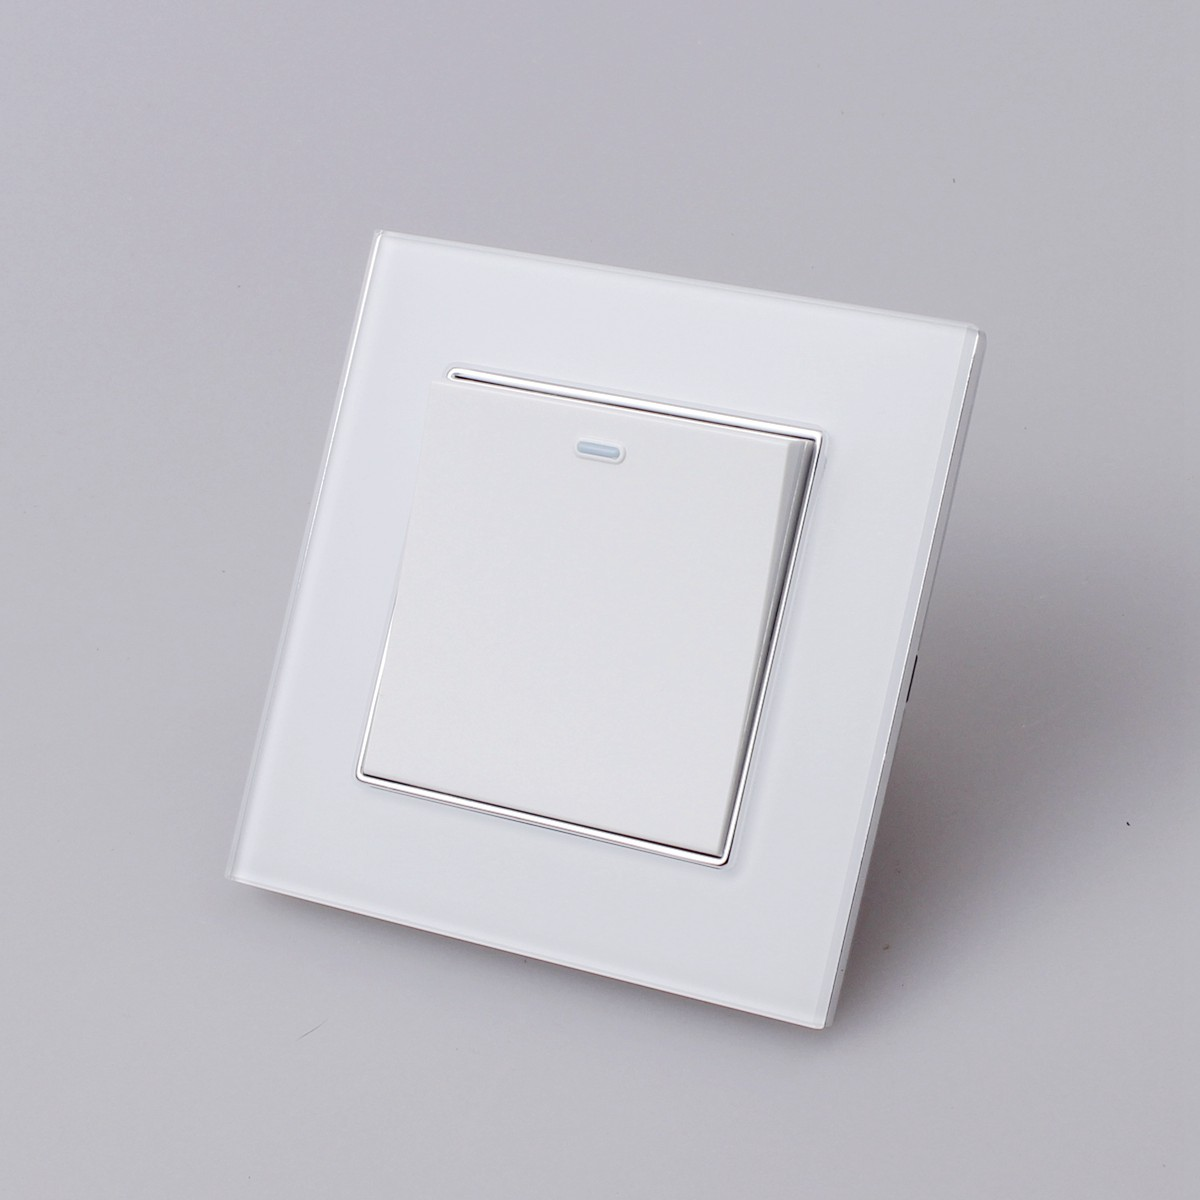 Uk Ac 90 250v 1 2 3 Gang Way Crystal Glass Panel Home Wall Light Switch Rocker